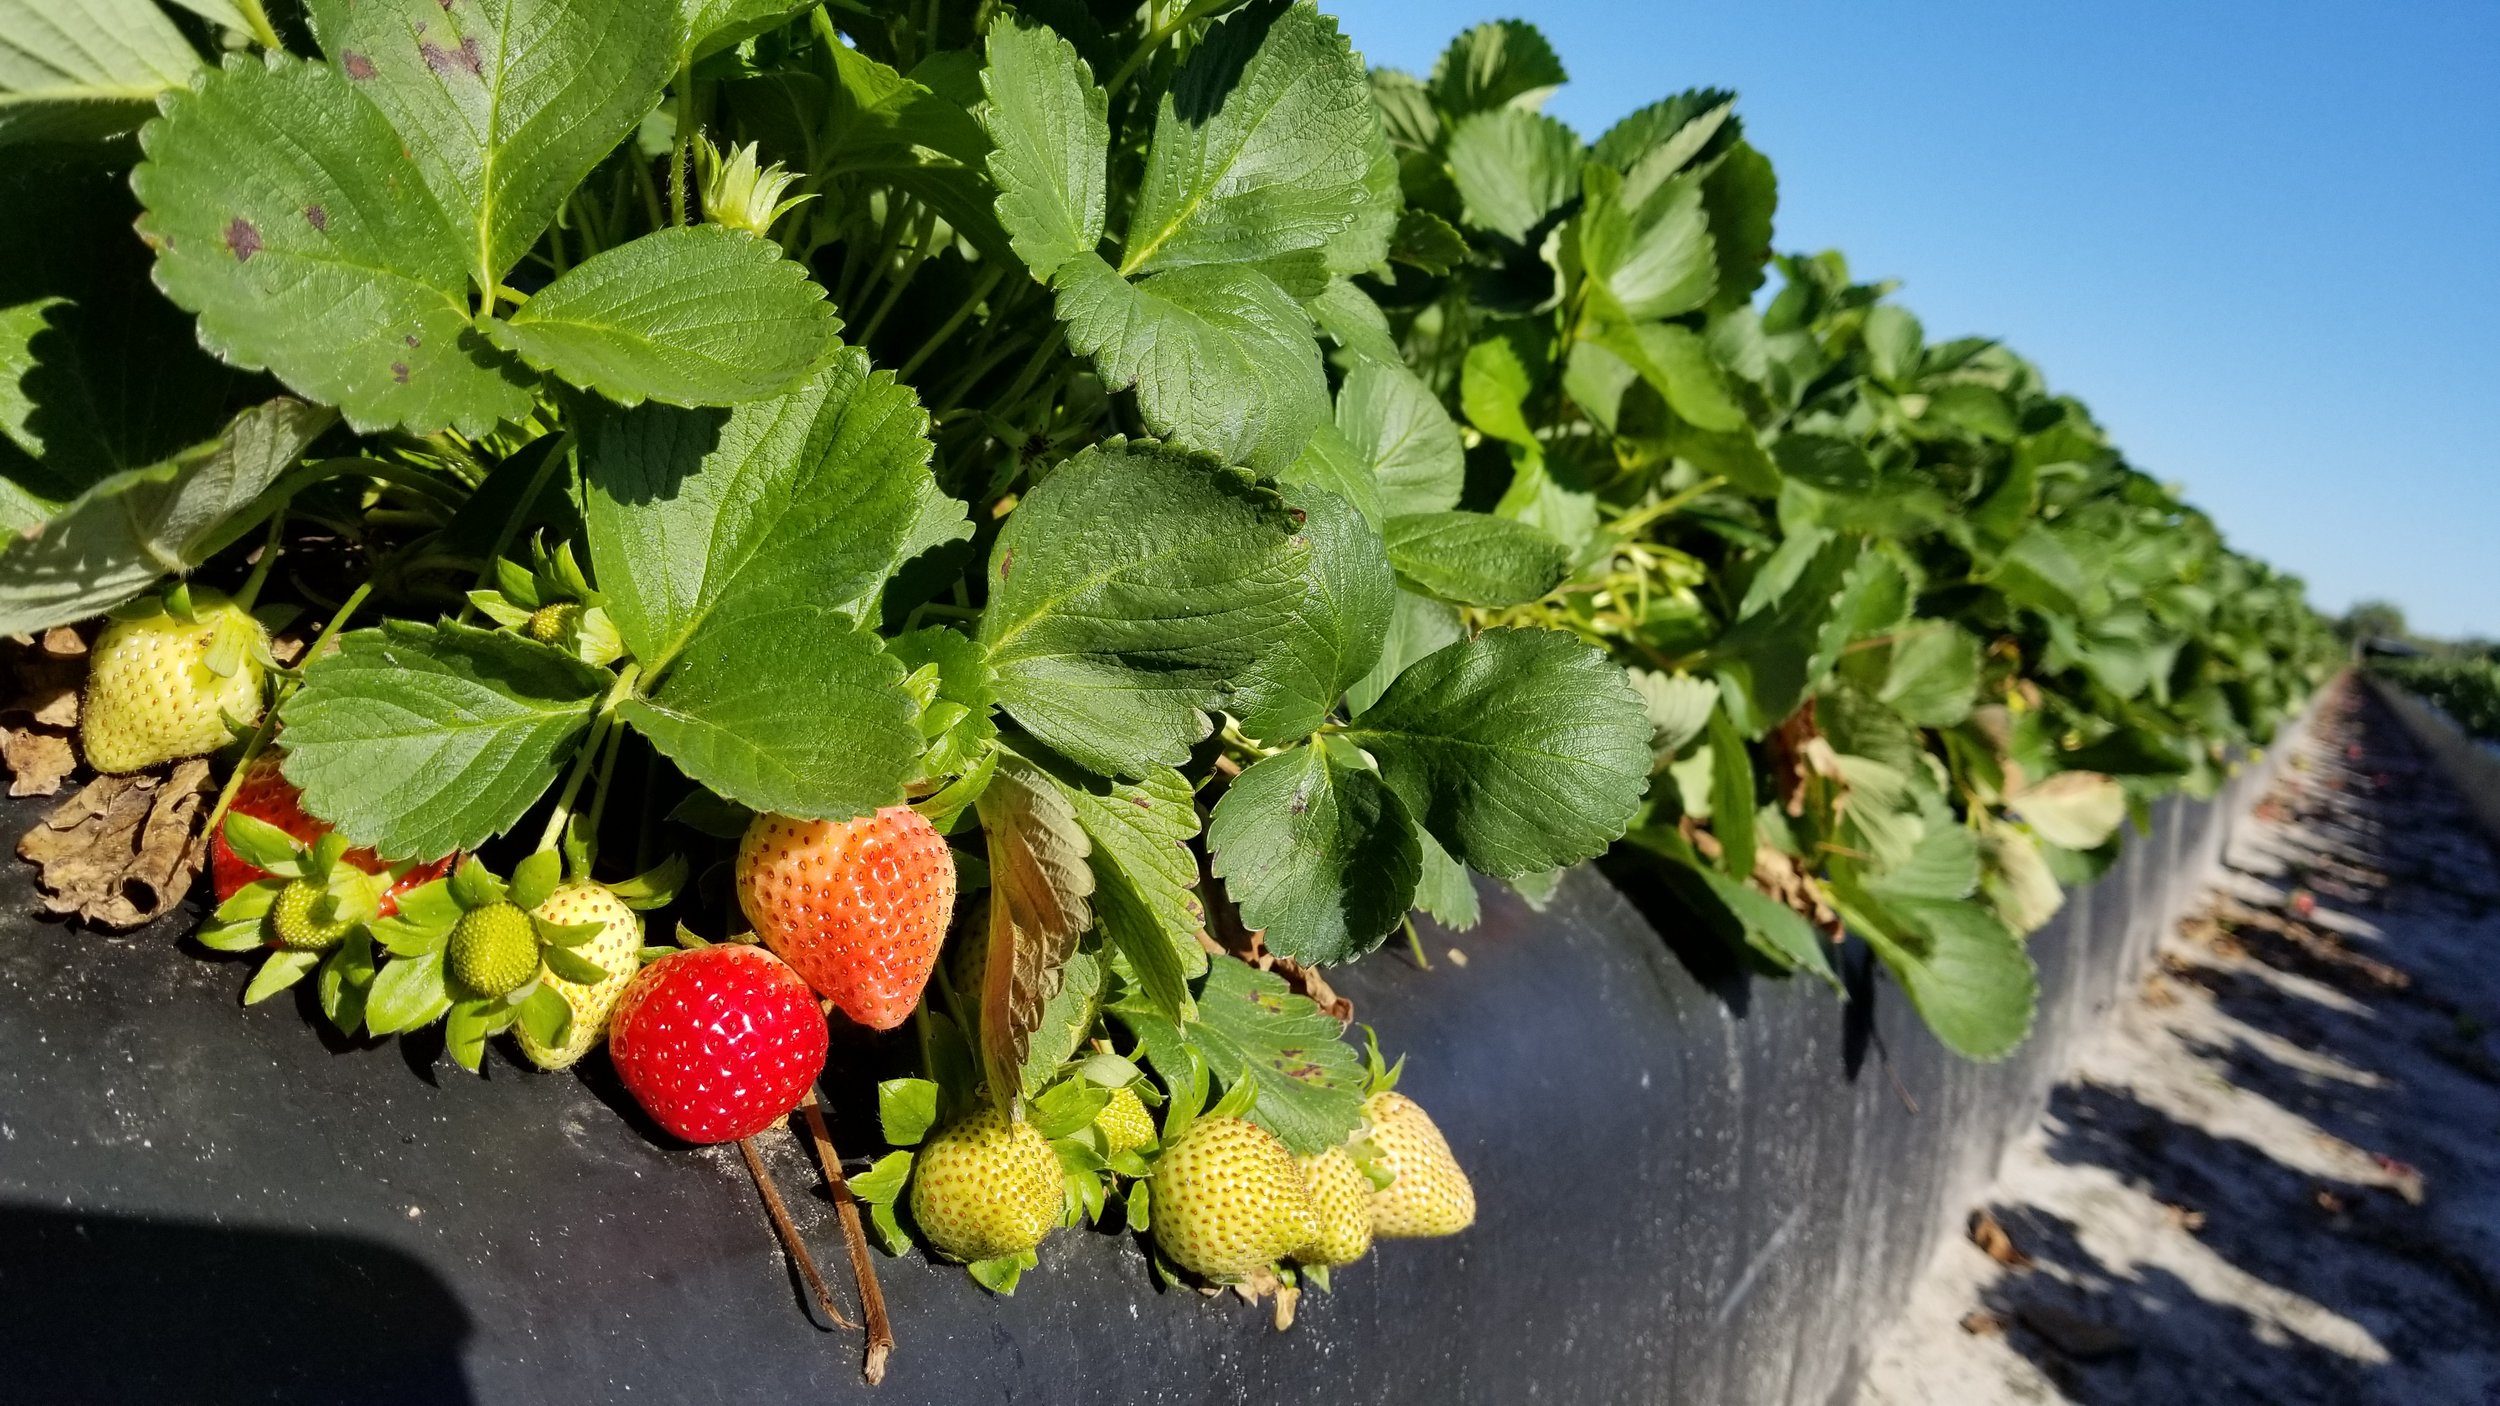 Fancy Farm strawberries in Plant City, Florida